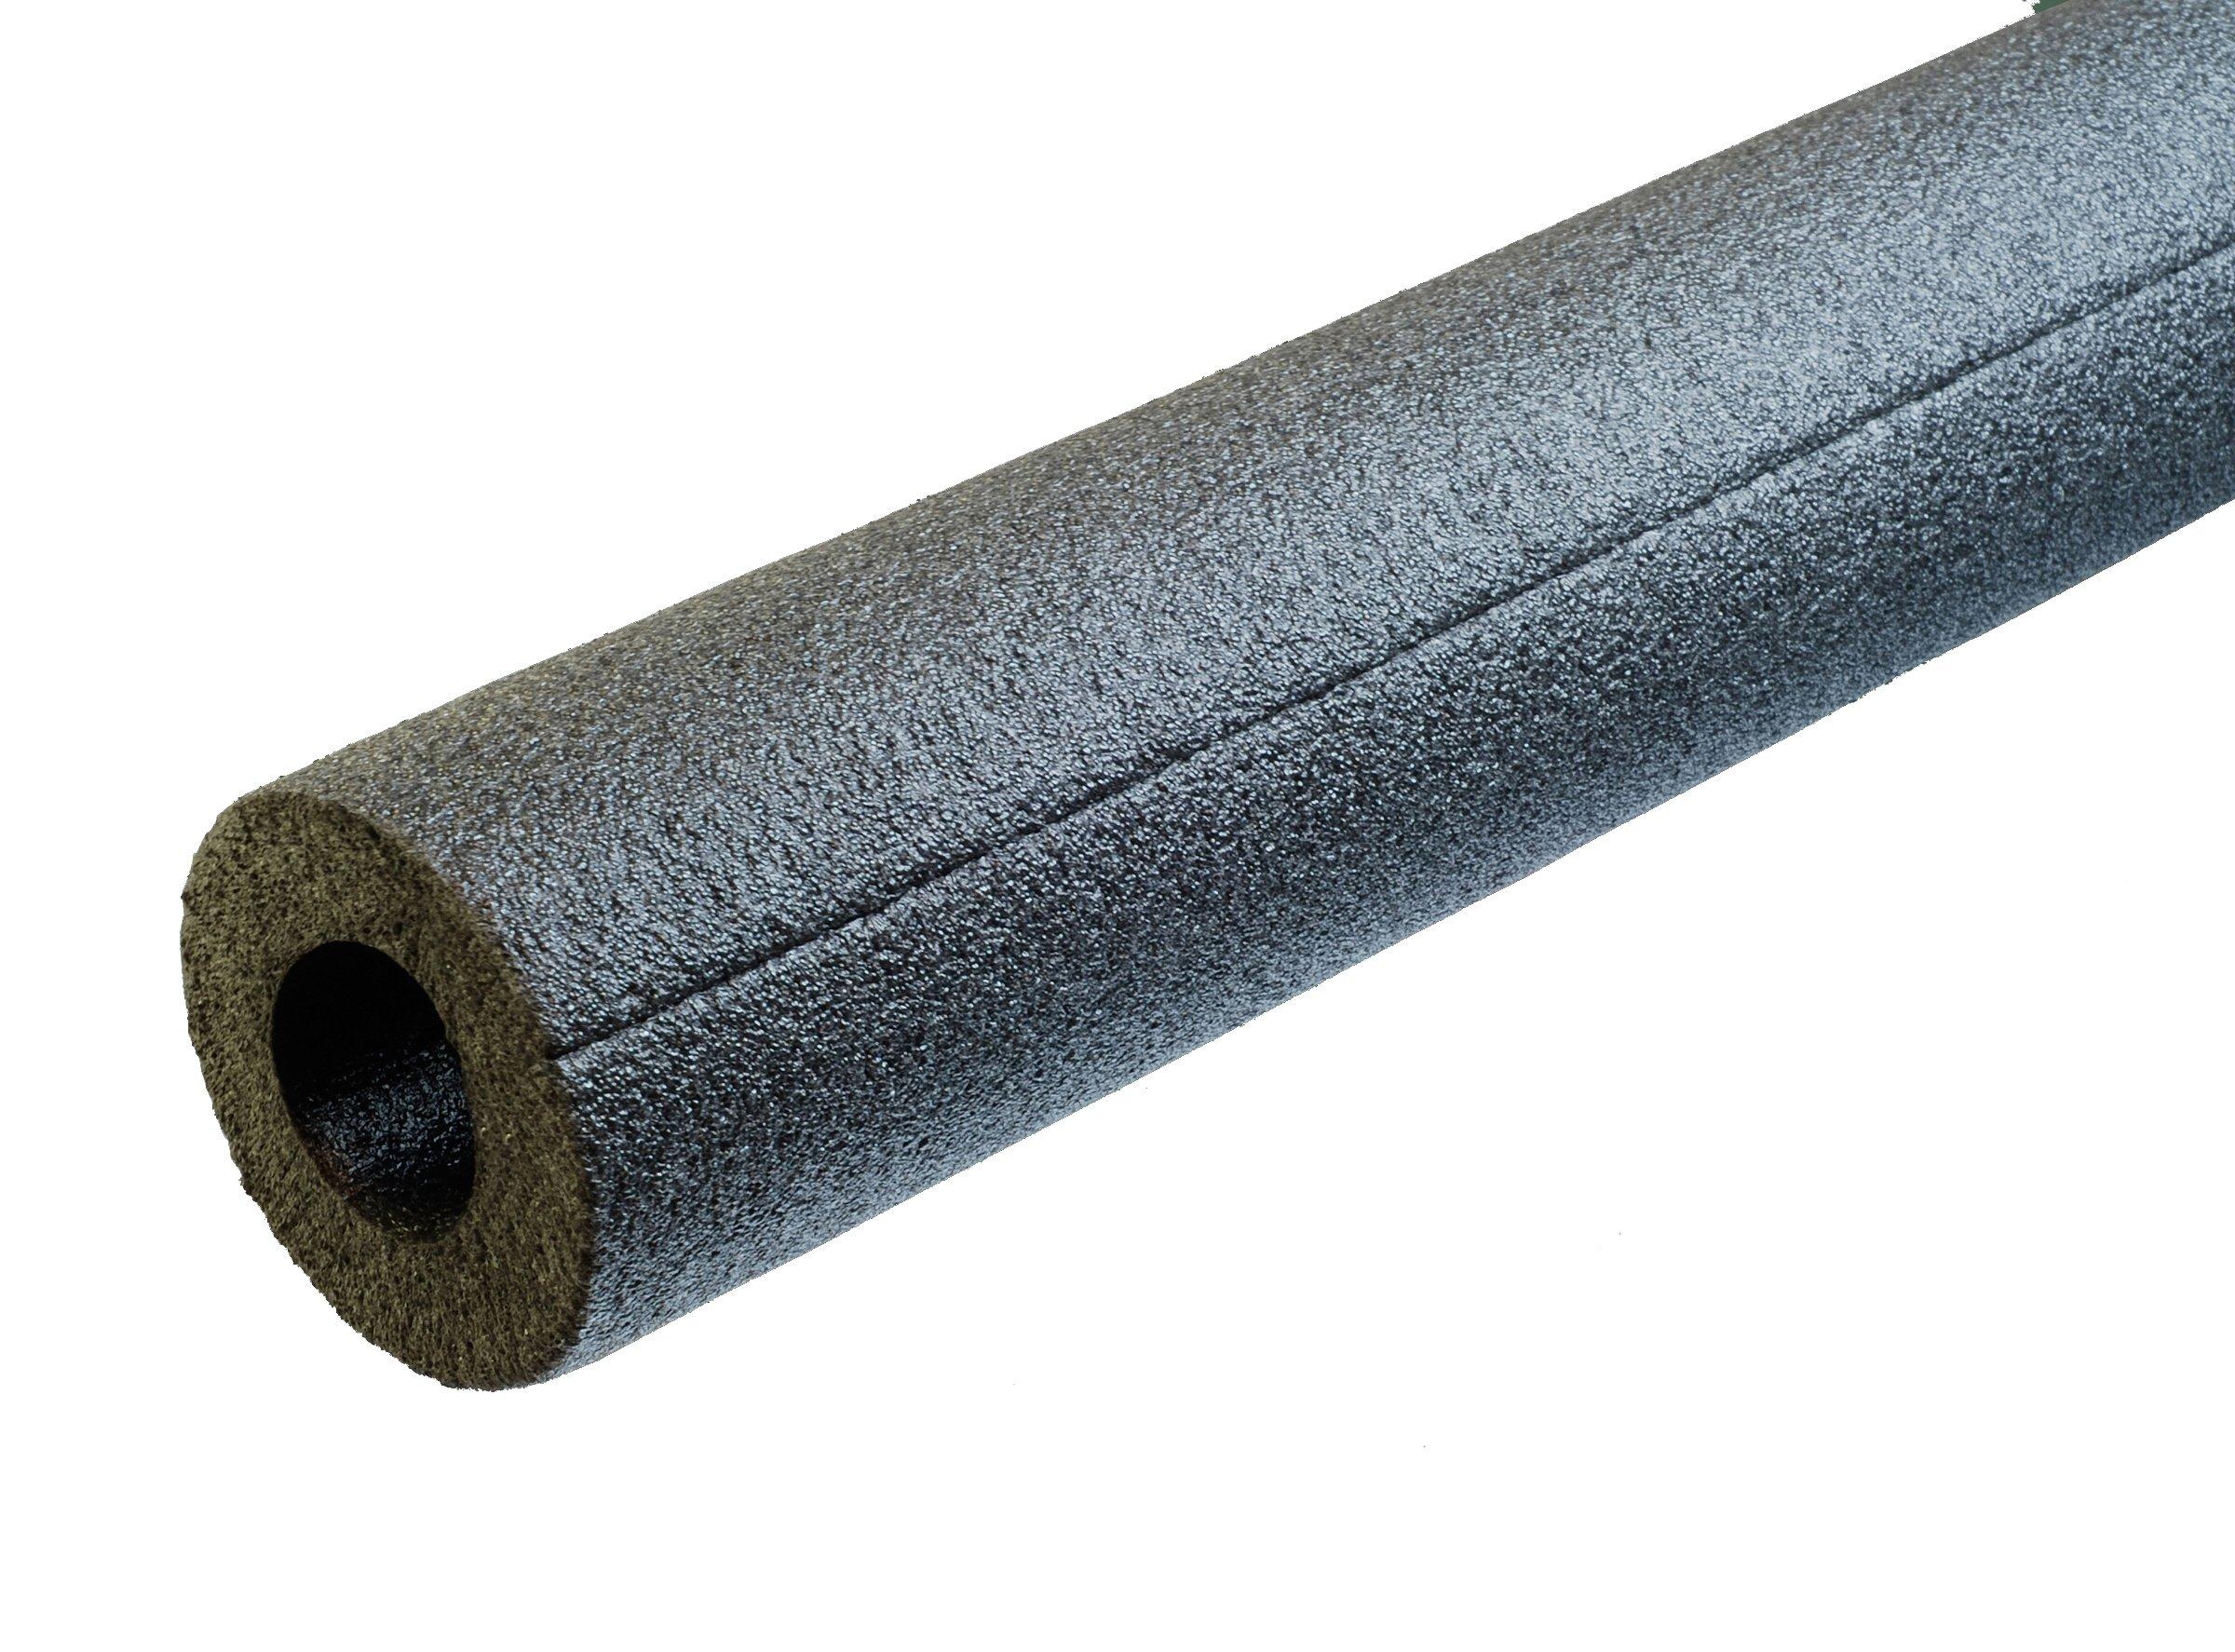 Tubolit DGT07834S 7/8'' x 3/4'' Semi Slit Foam Pipe Insulation - 150 Lineal Feet/Carton, Polyethylene by Tubolit